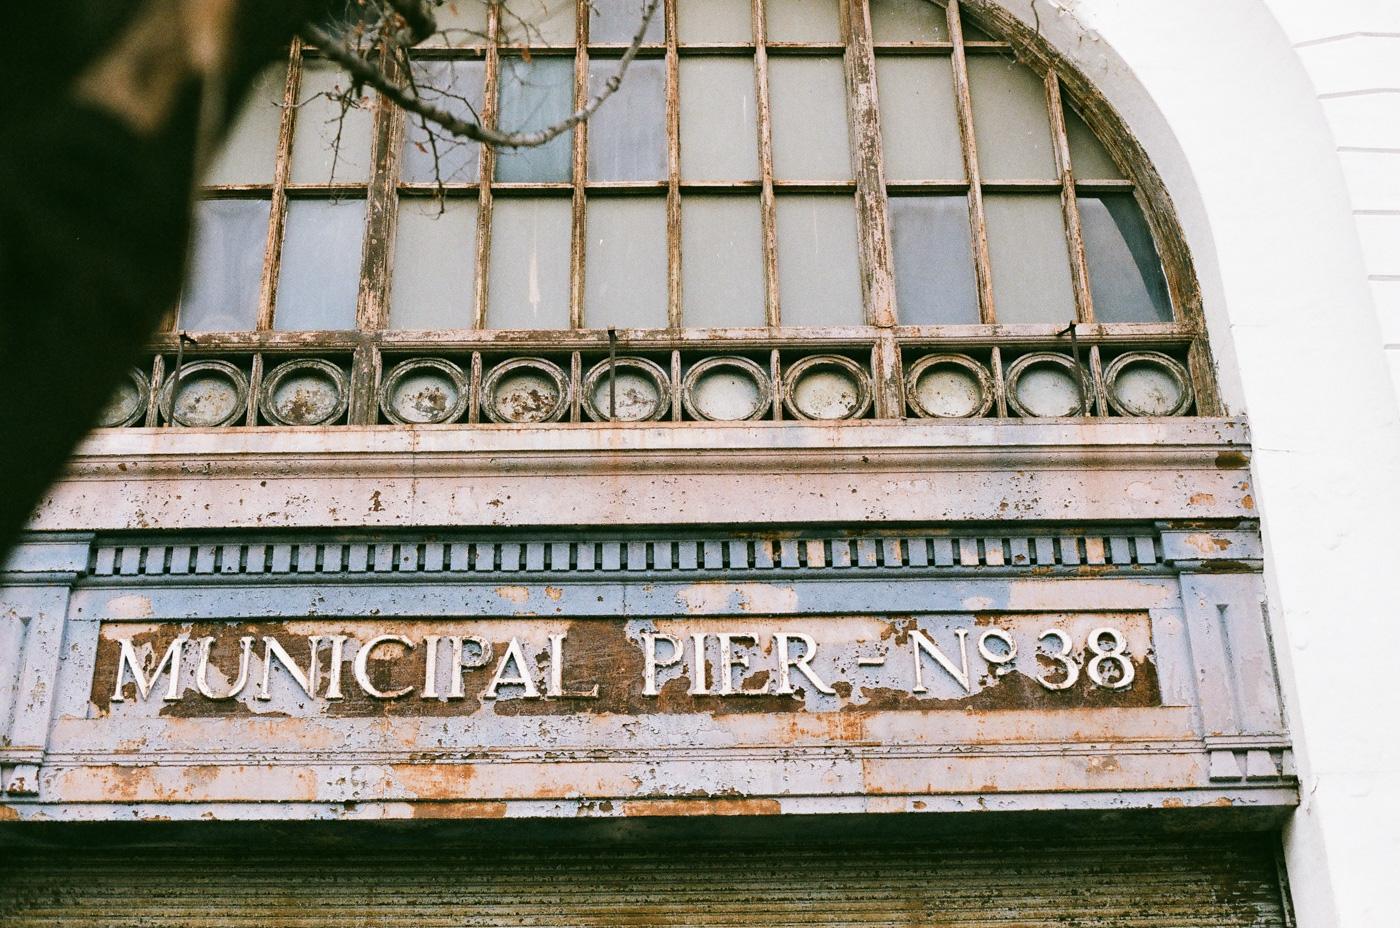 Municipal Pier No. 38